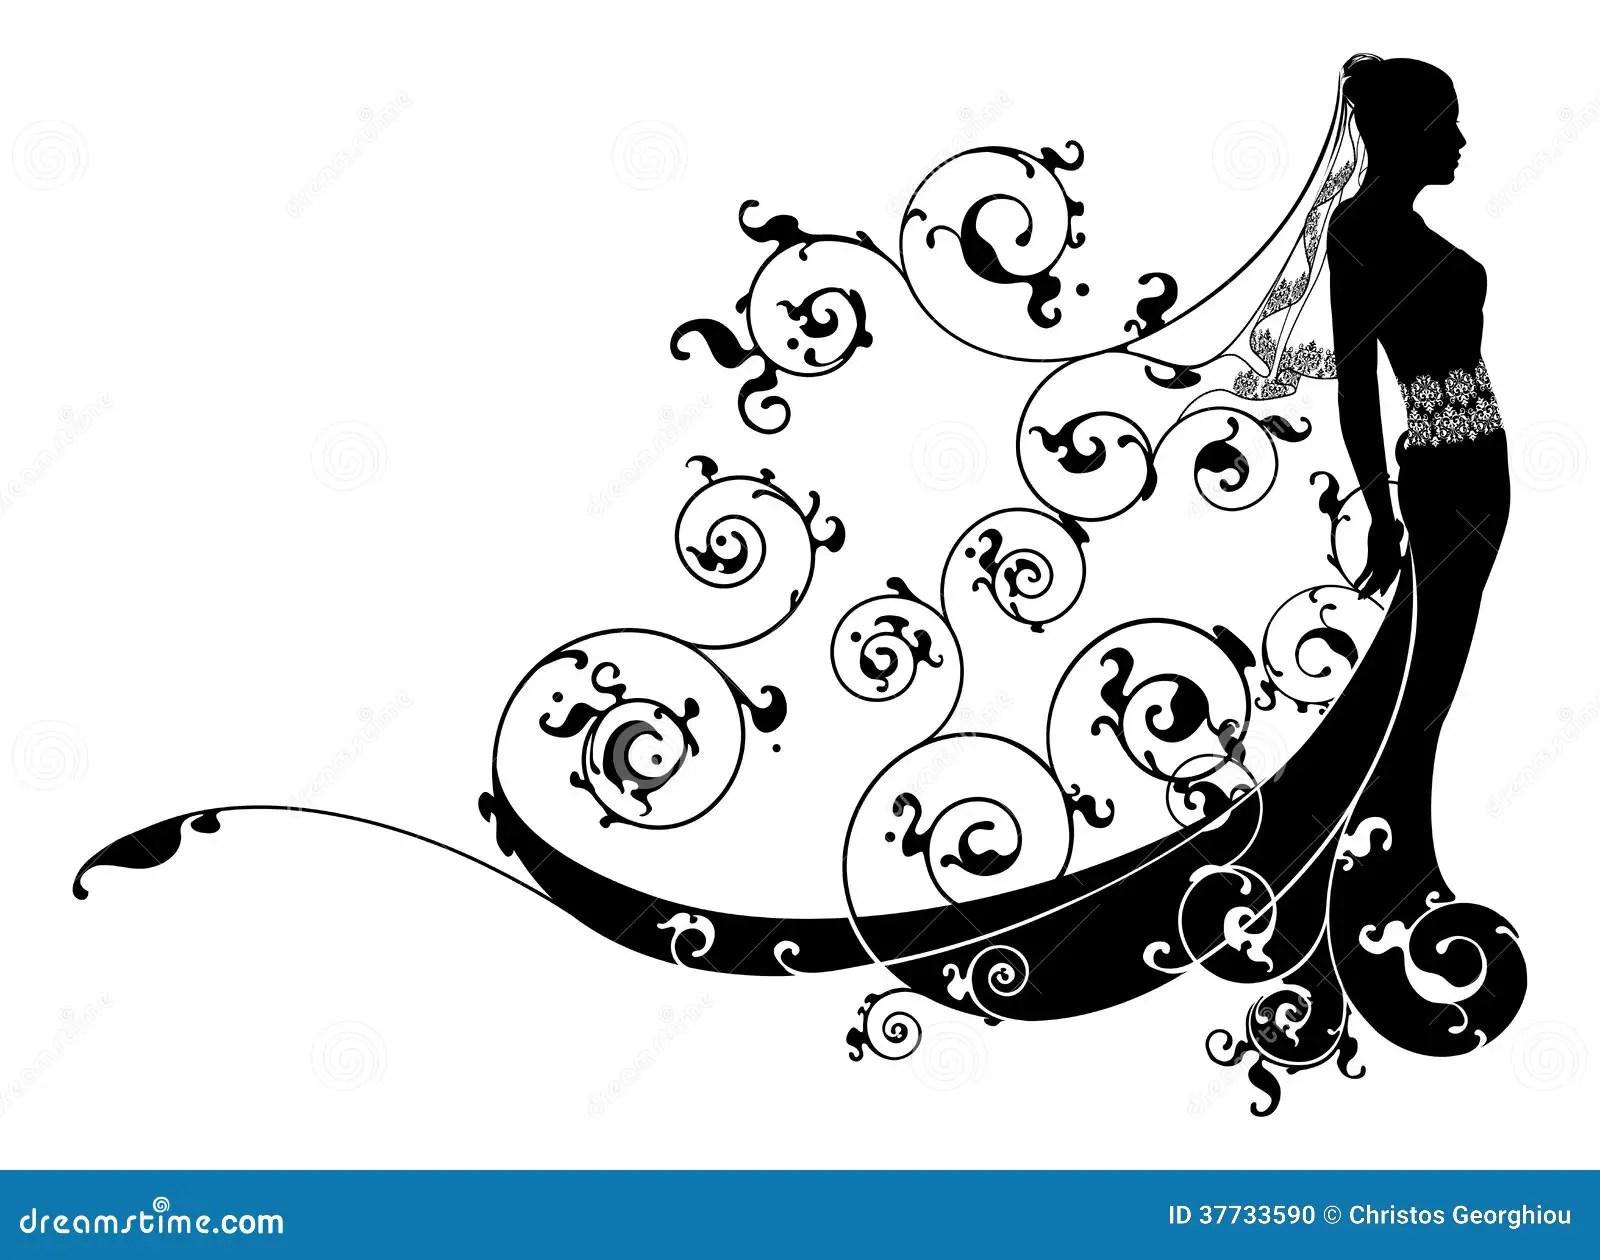 Princess Bride Wedding Dress Concept Stock Vector